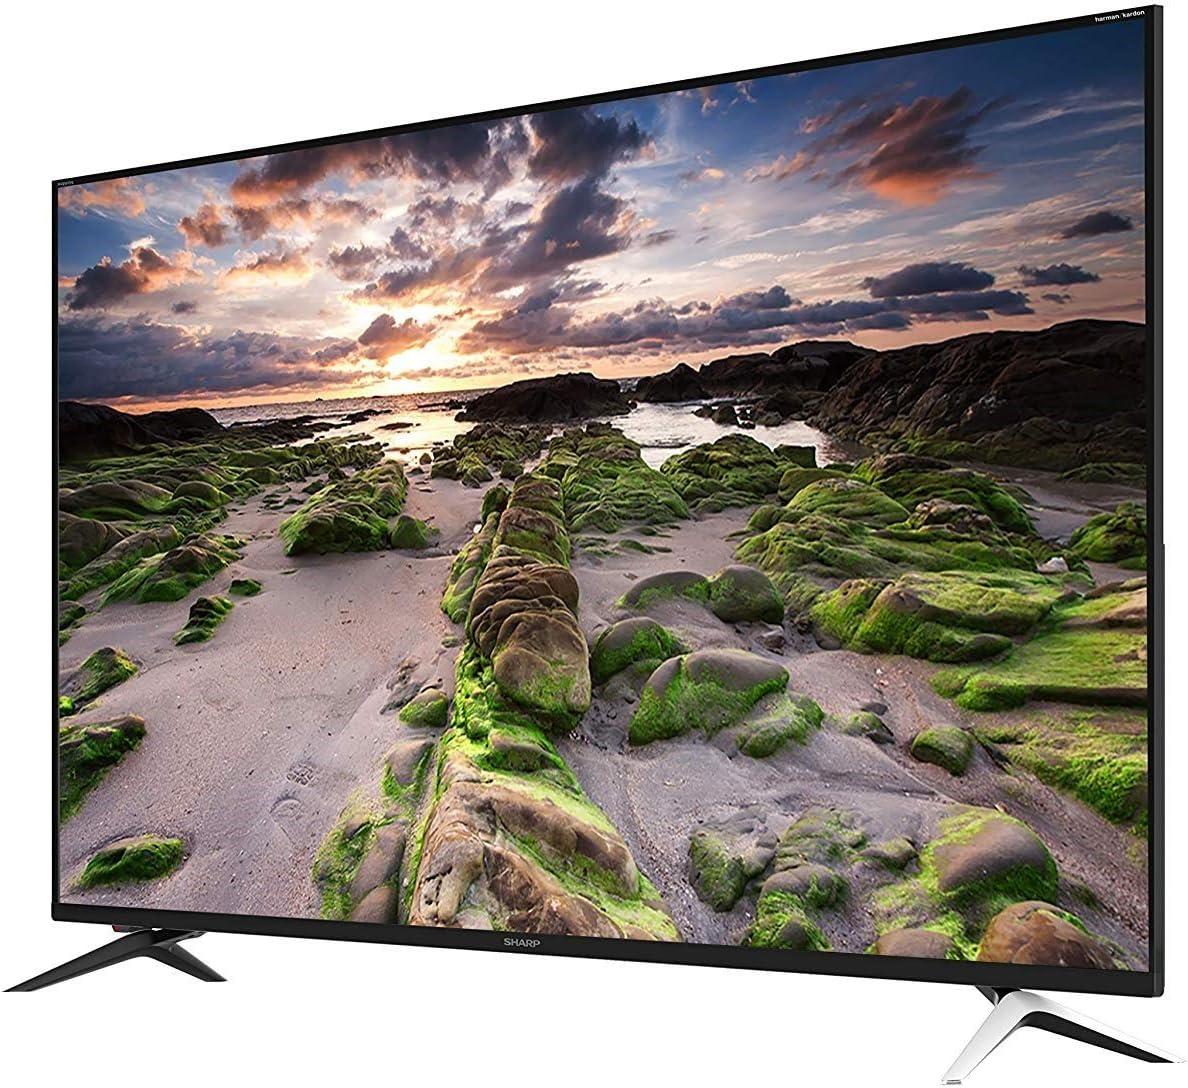 Telewizor Sharp LC-70UI9362E: Amazon.es: Electrónica